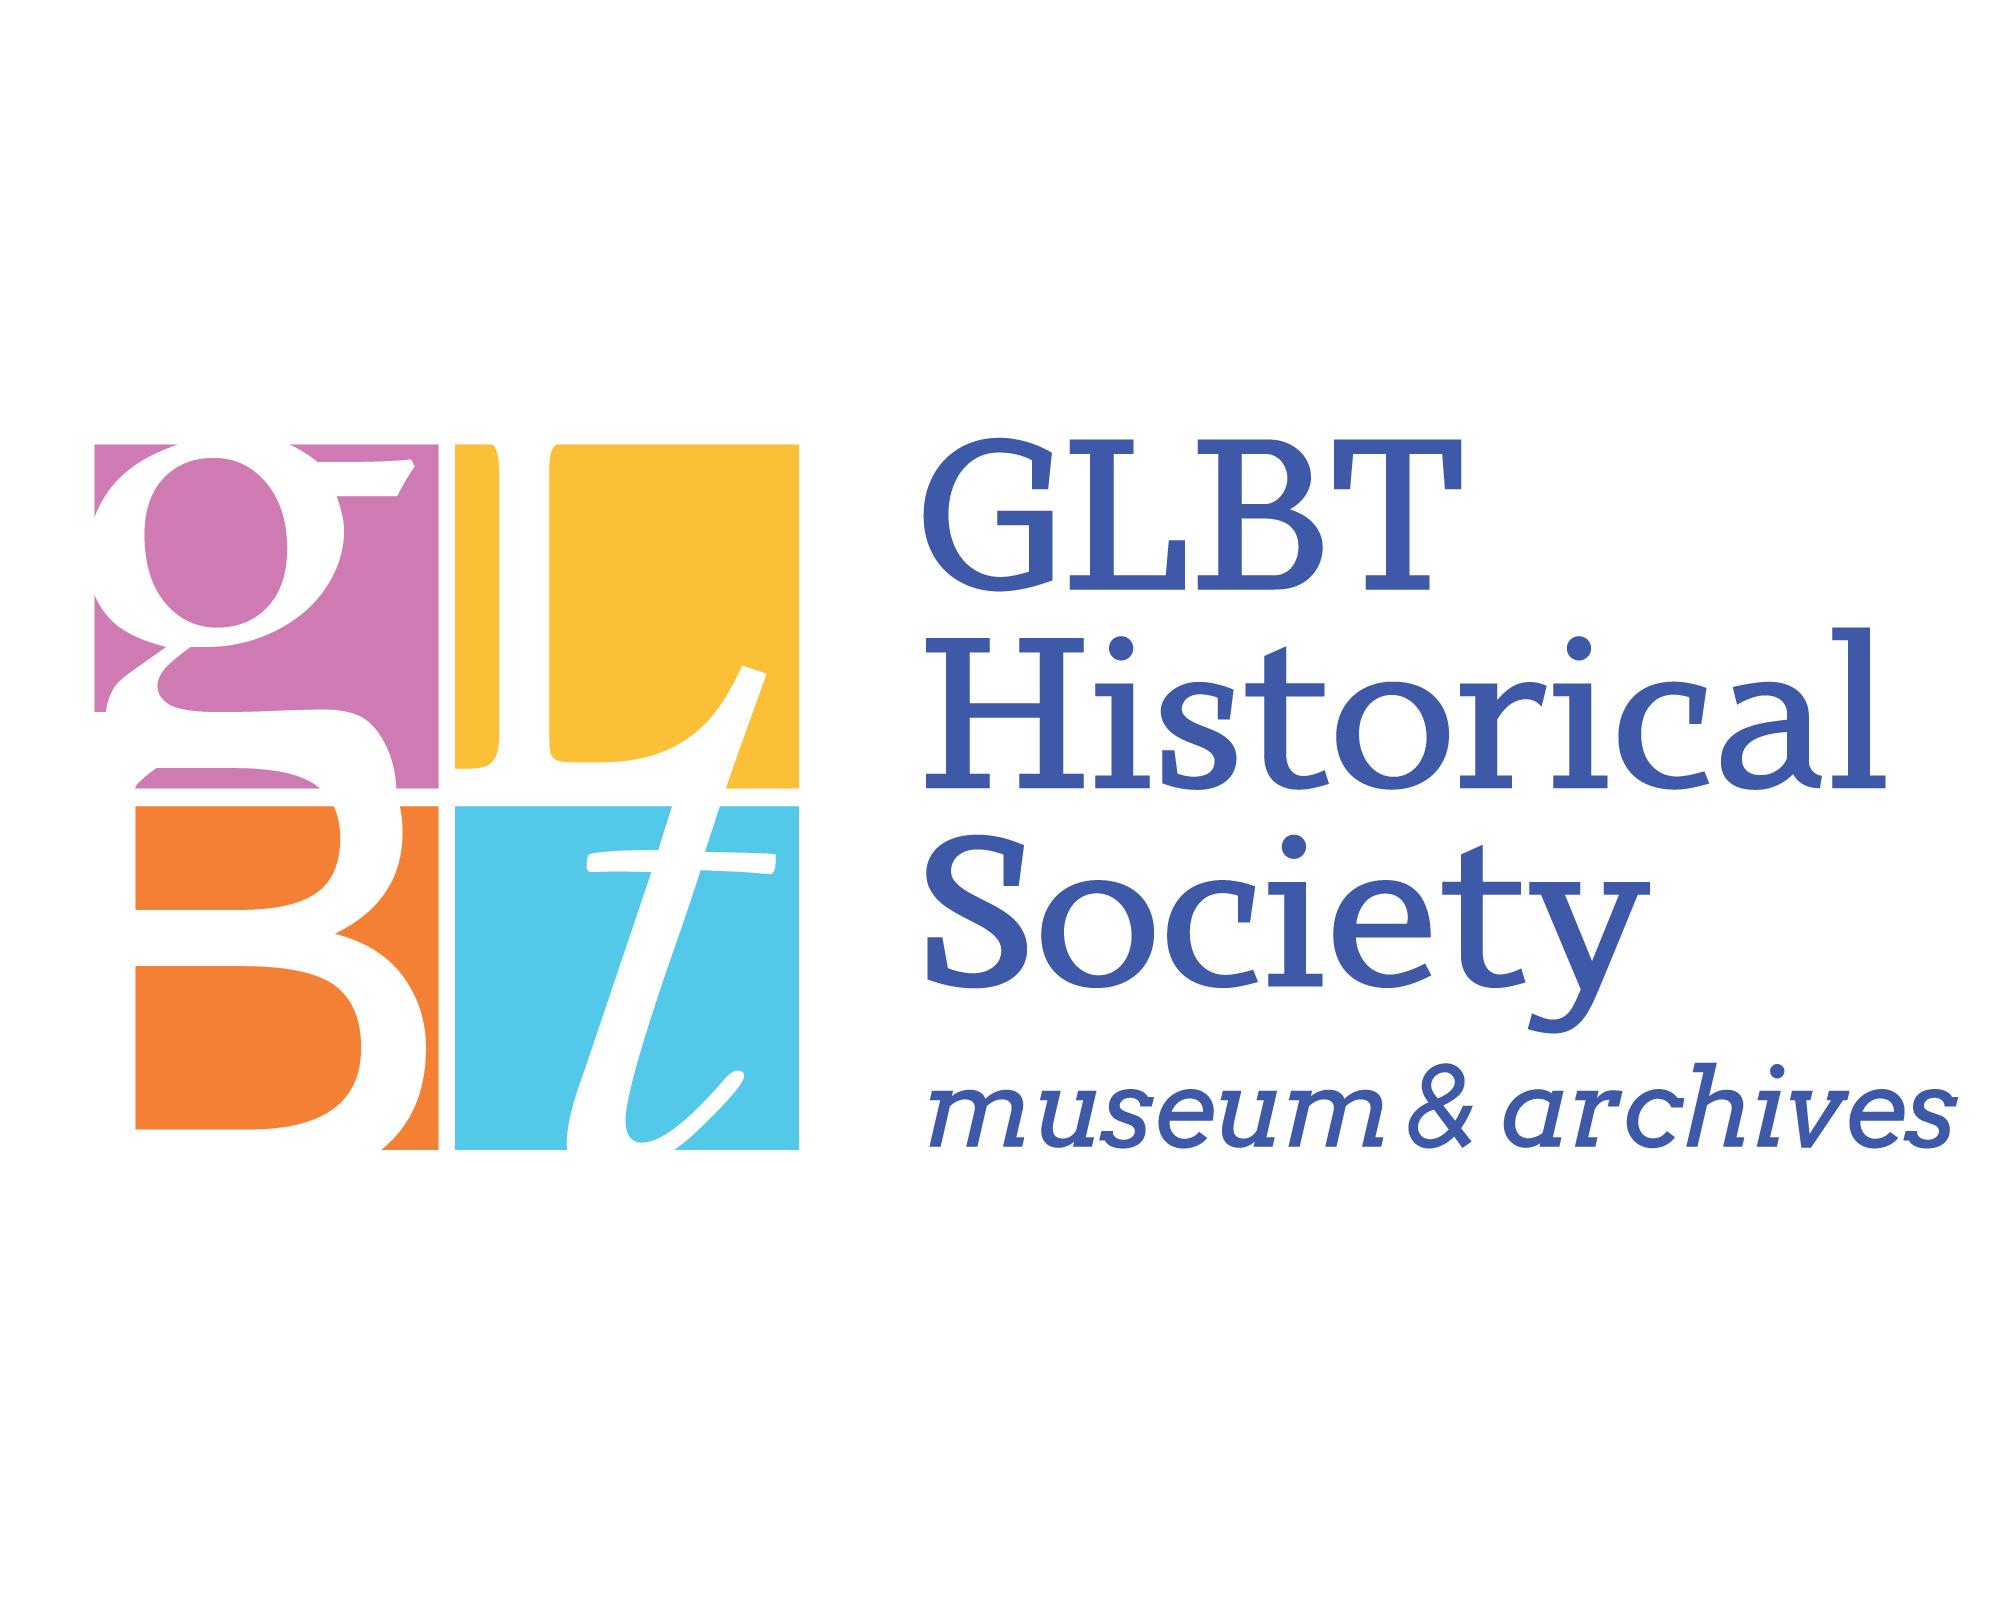 GLBTHistoryMuseum_StyleGuide2018_GLBT2018-Color-Horizontal.jpg